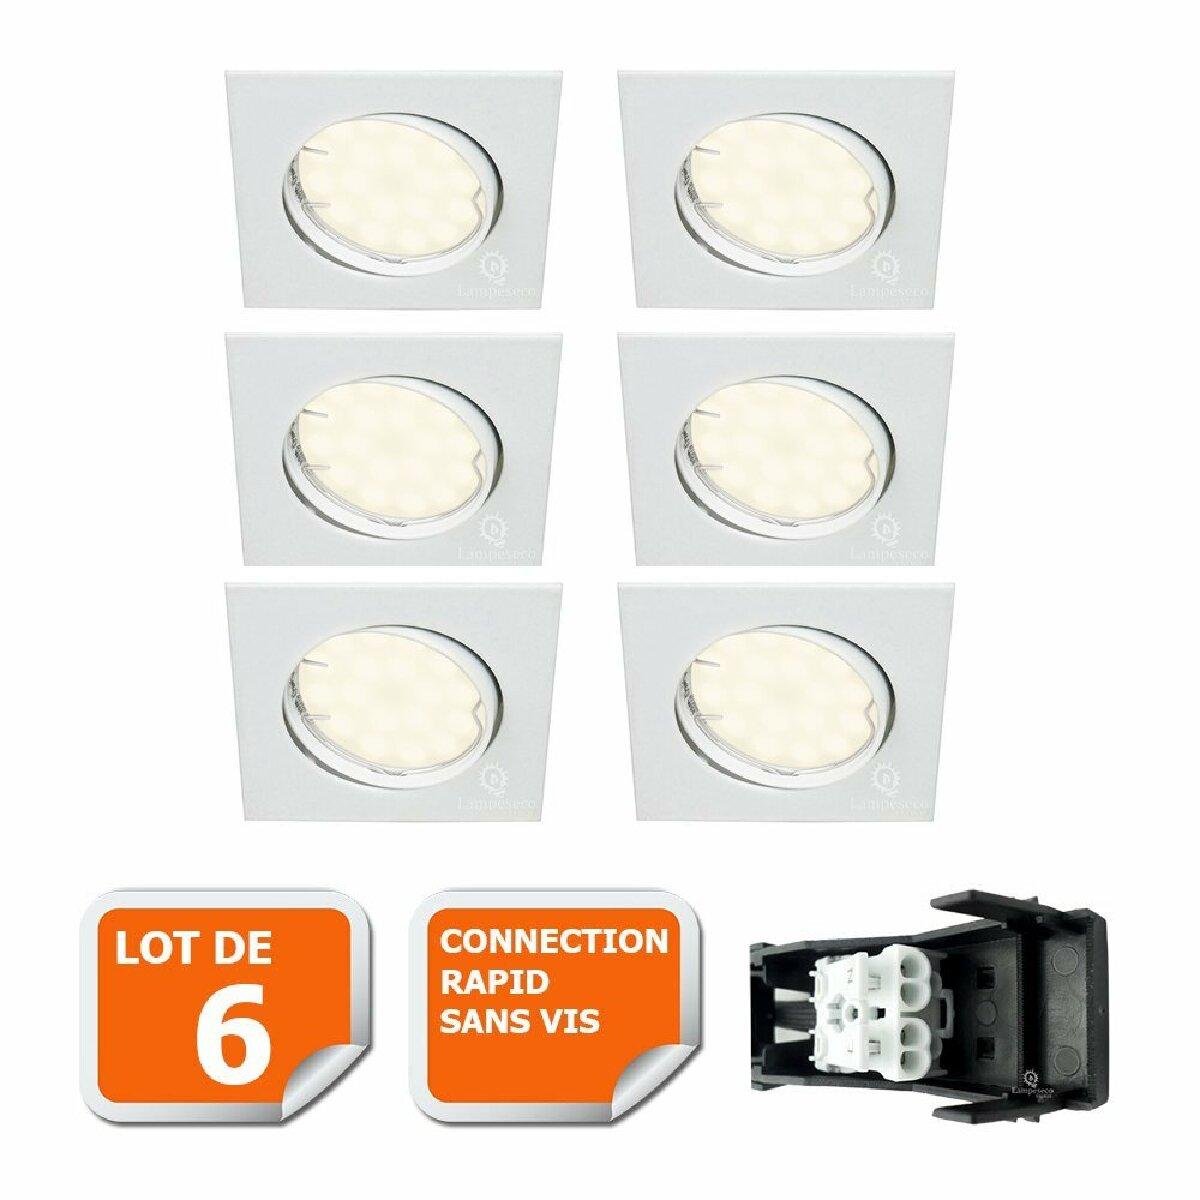 Lampesecoenergie LOT DE 6 SPOT ENCASTRABLE ORIENTABLE CARRE LED SMD GU10 230V BLANC RENDU ENVIRON 50W HALOGENE